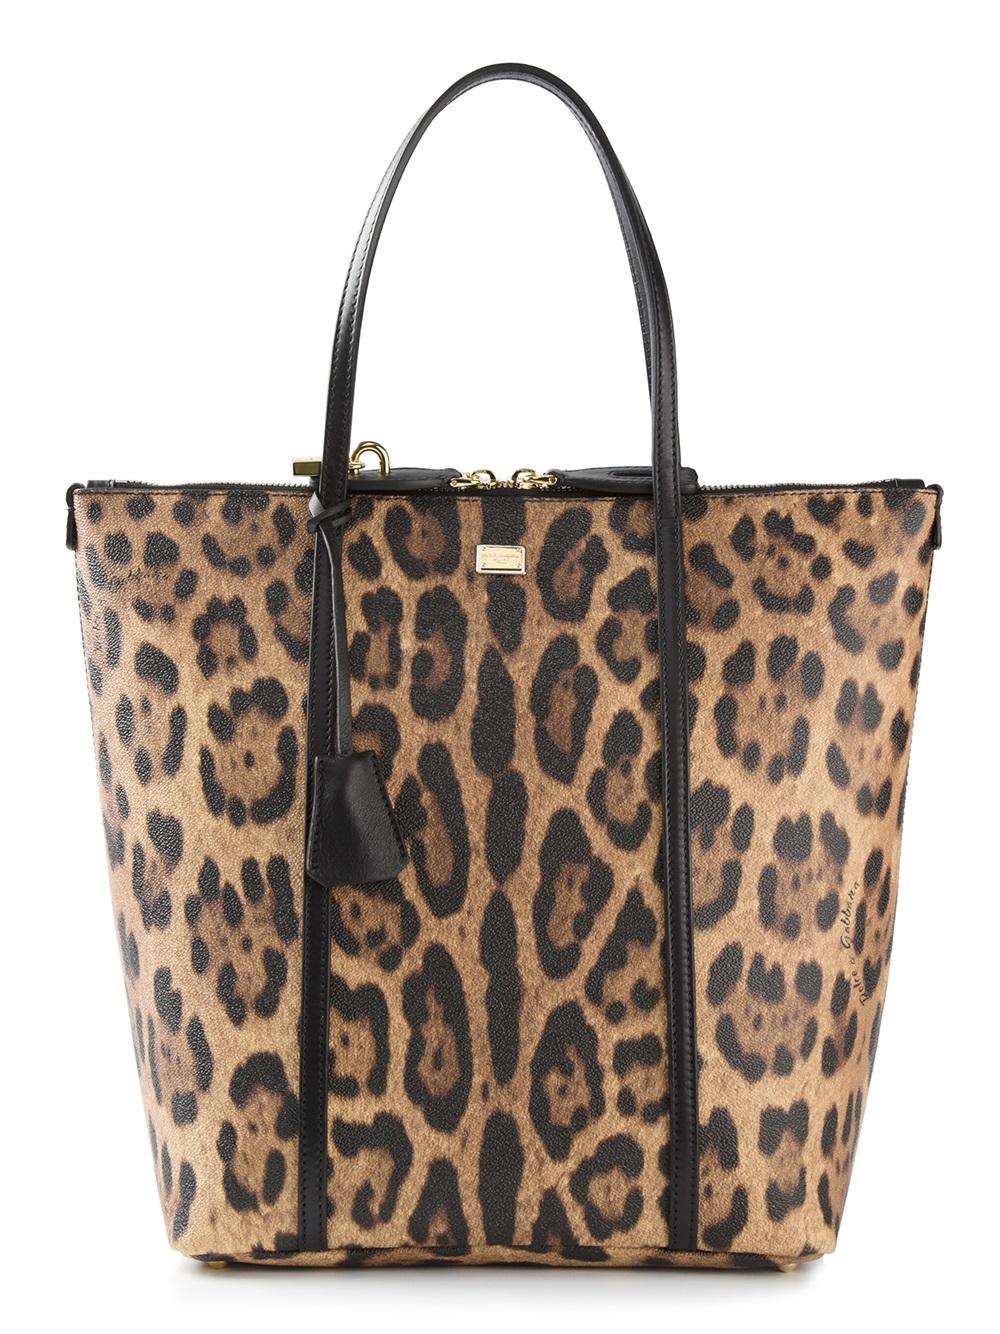 29a0619d2a4f Lyst - Dolce   Gabbana Leopard Print Shopping Bag